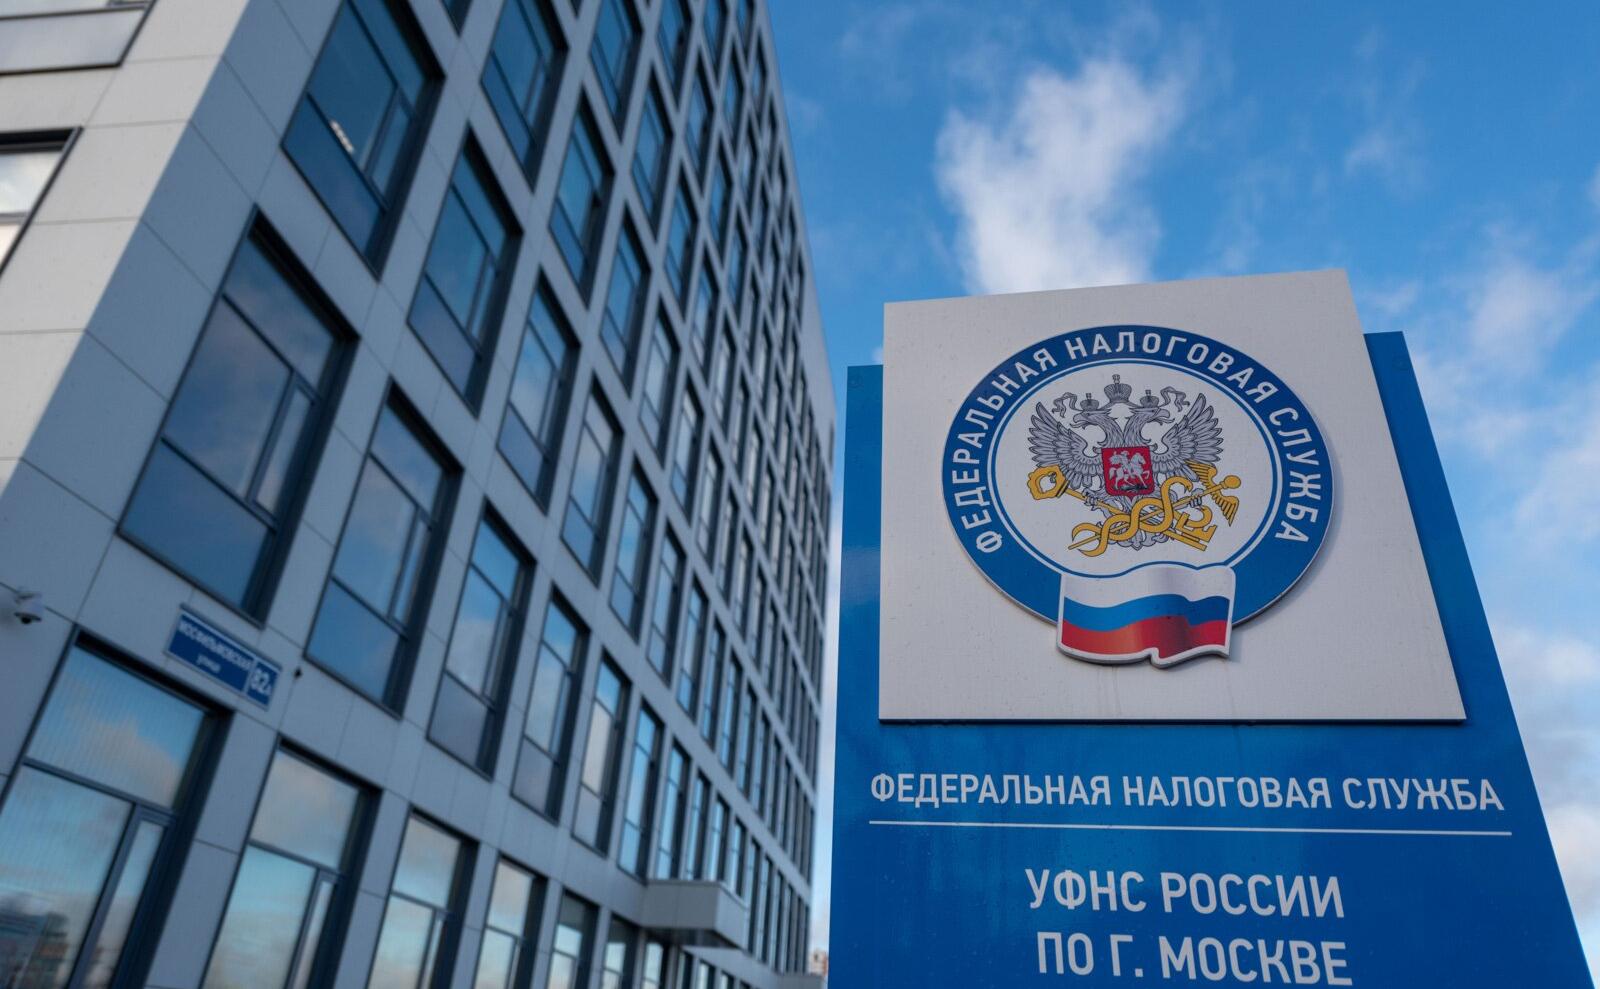 Фото: Владимир Новиков / РИА Новости